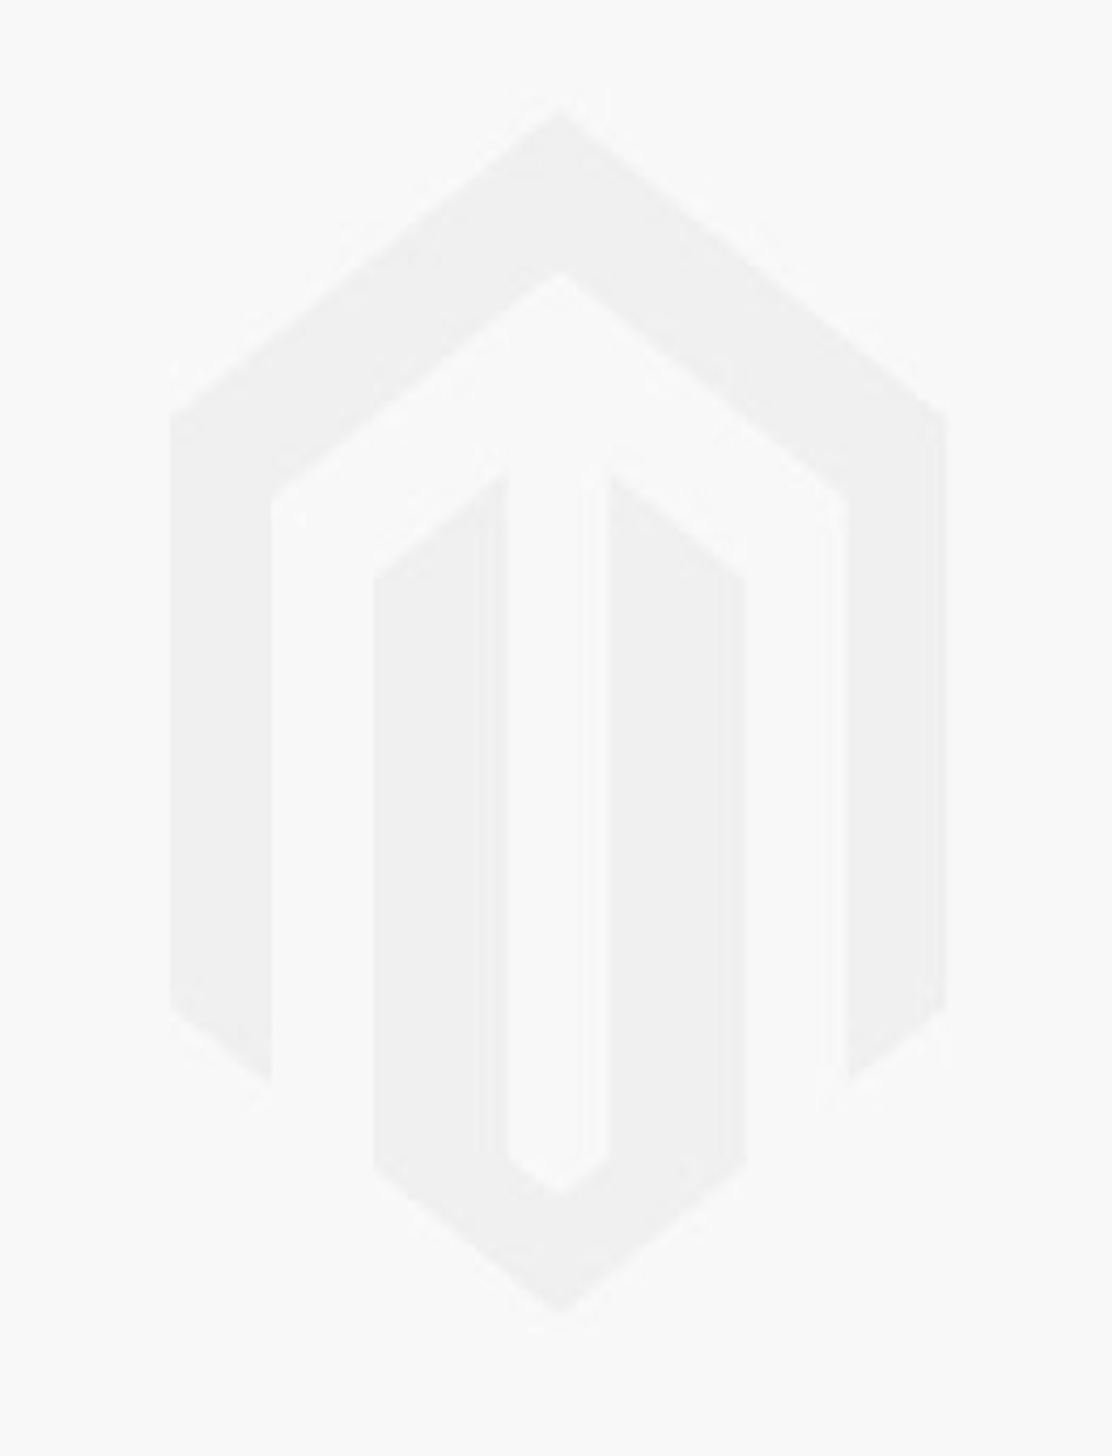 8mm Low Profile Silhouette Diamond Stud Earring Image #1